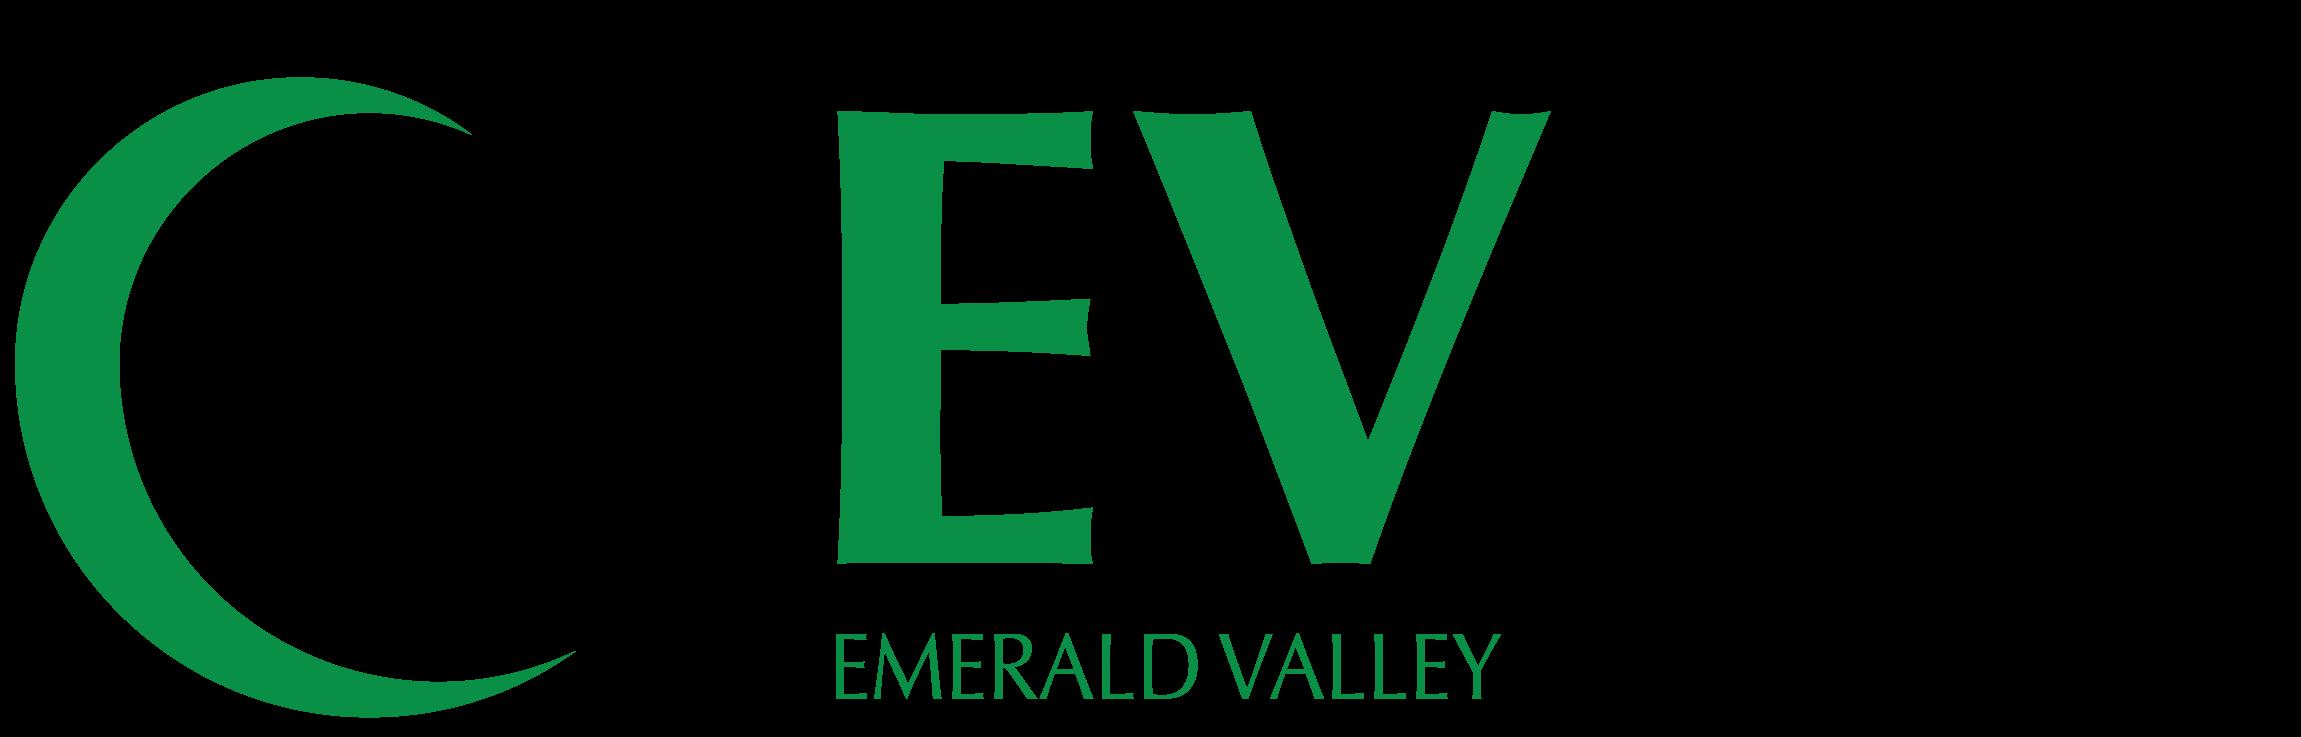 Emerald Valley Lean Association